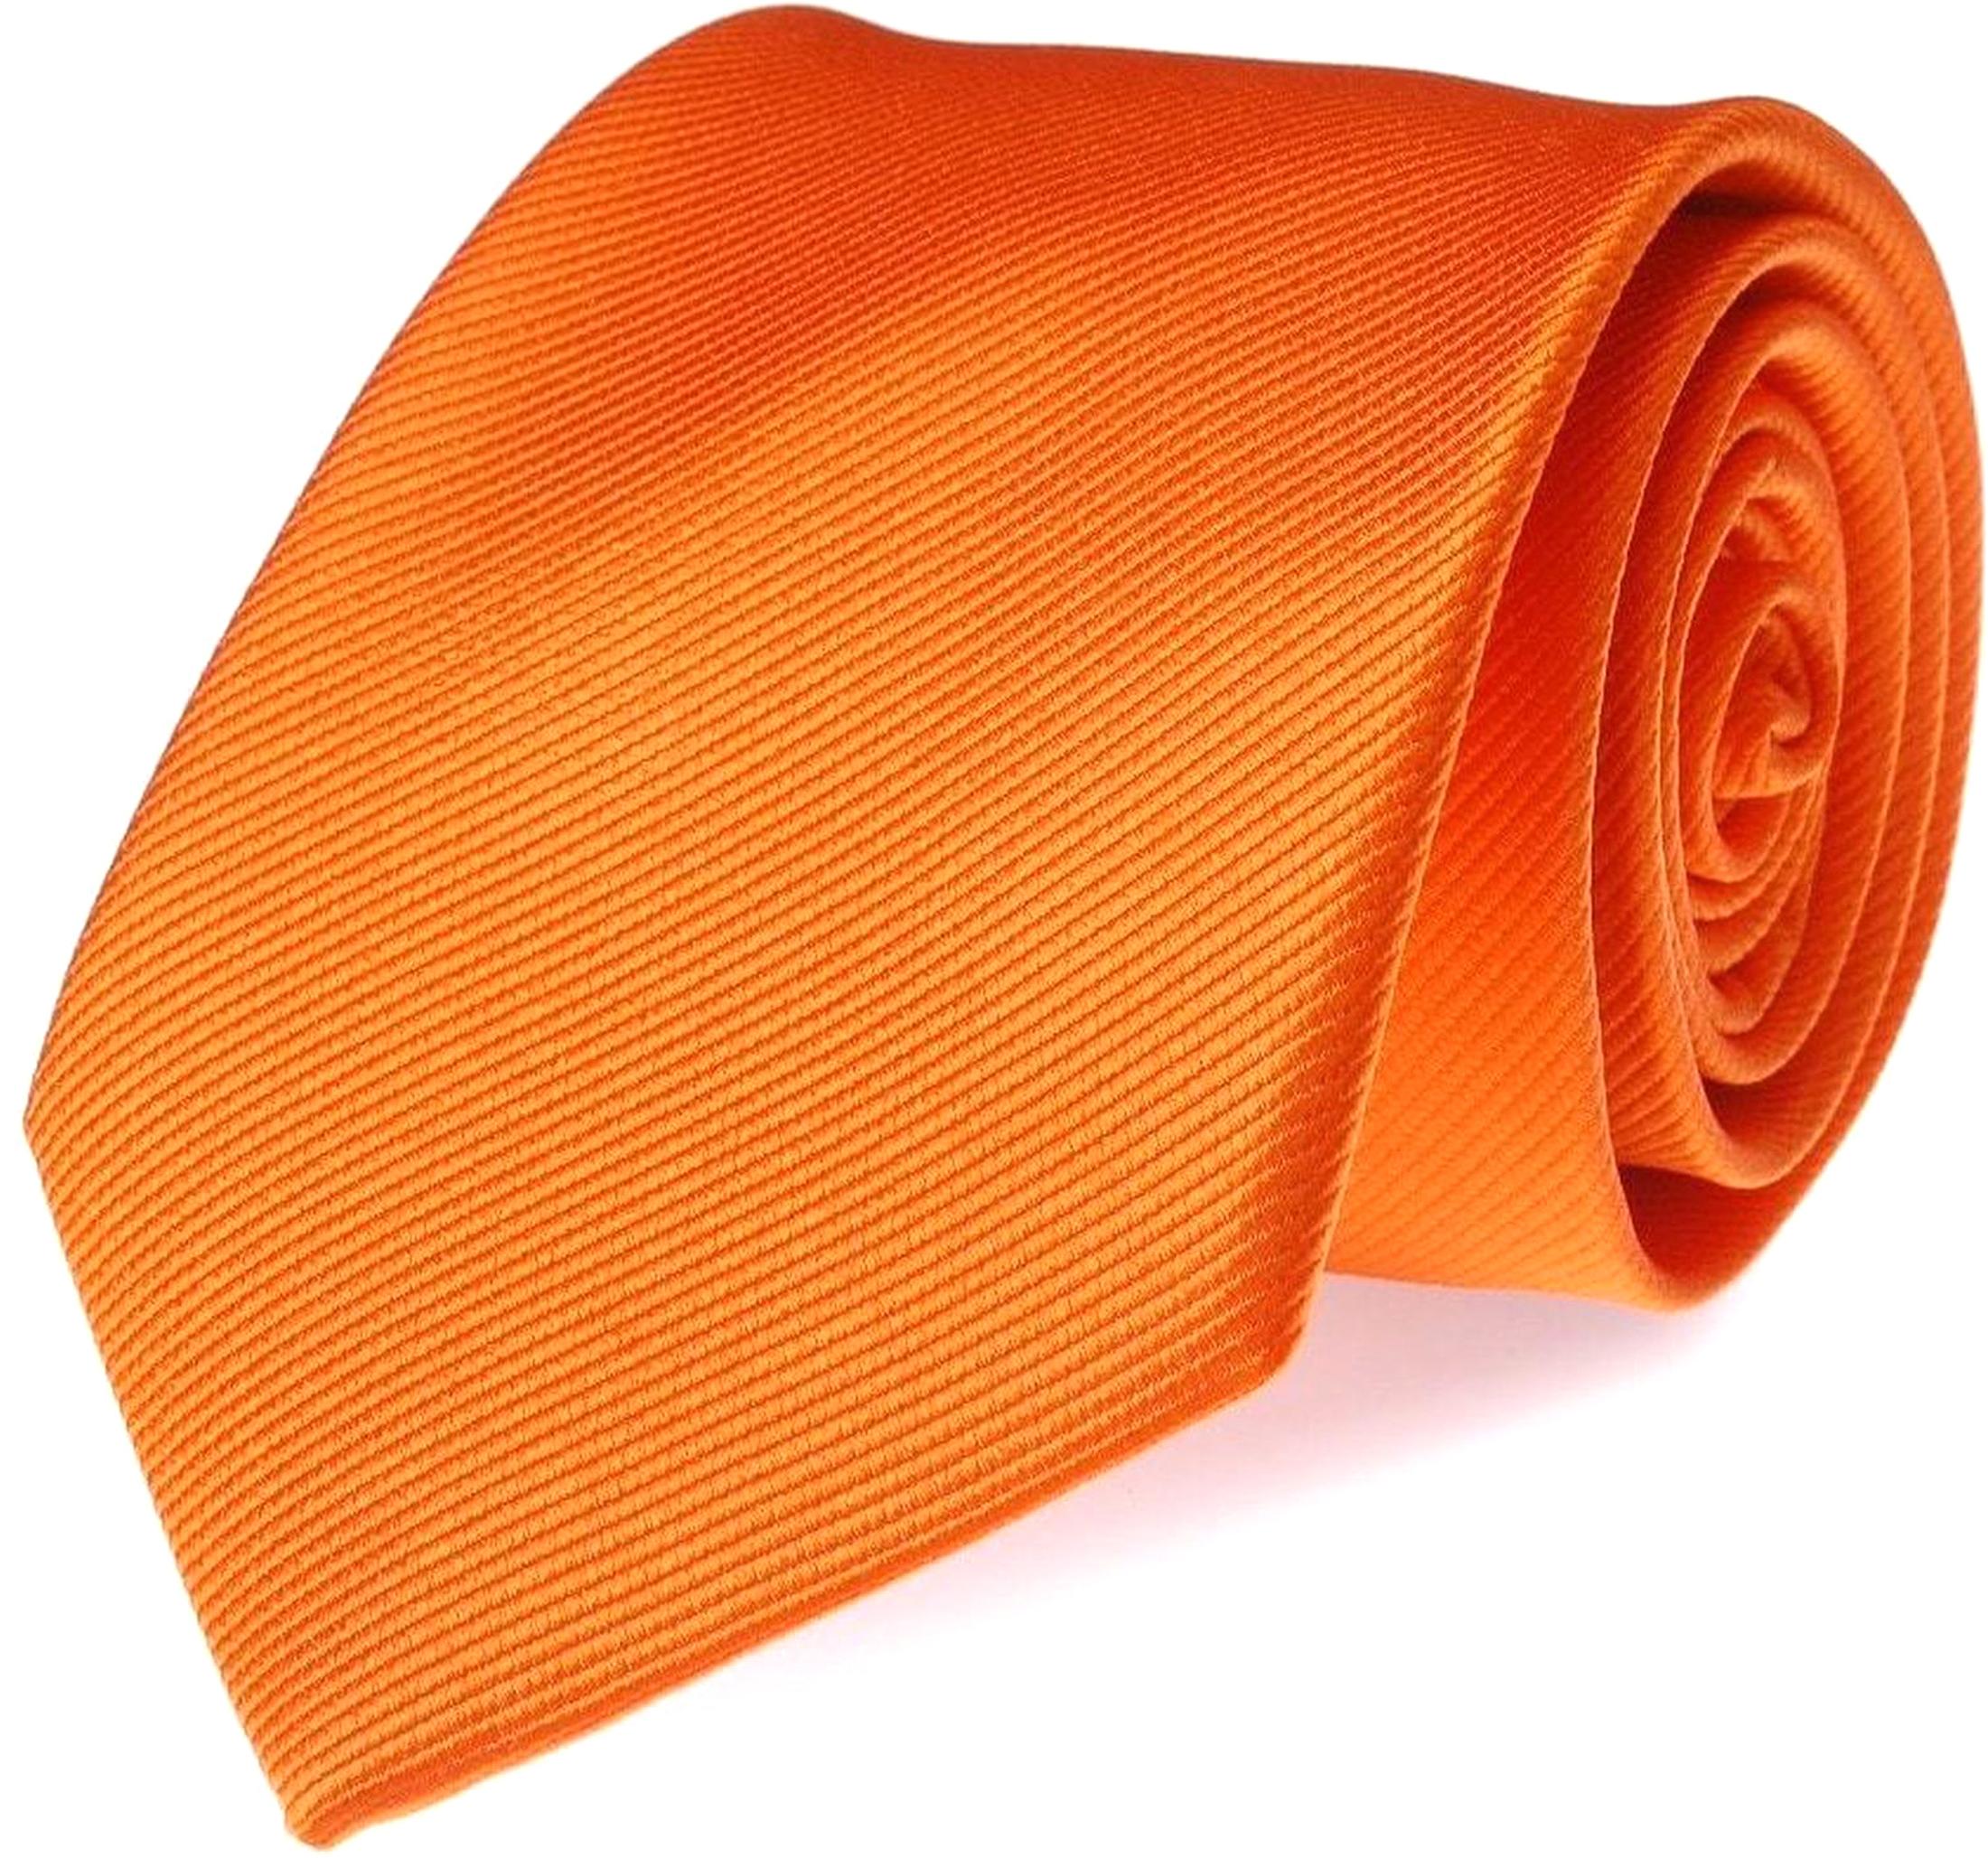 Silk Tie Orange F01 foto 0